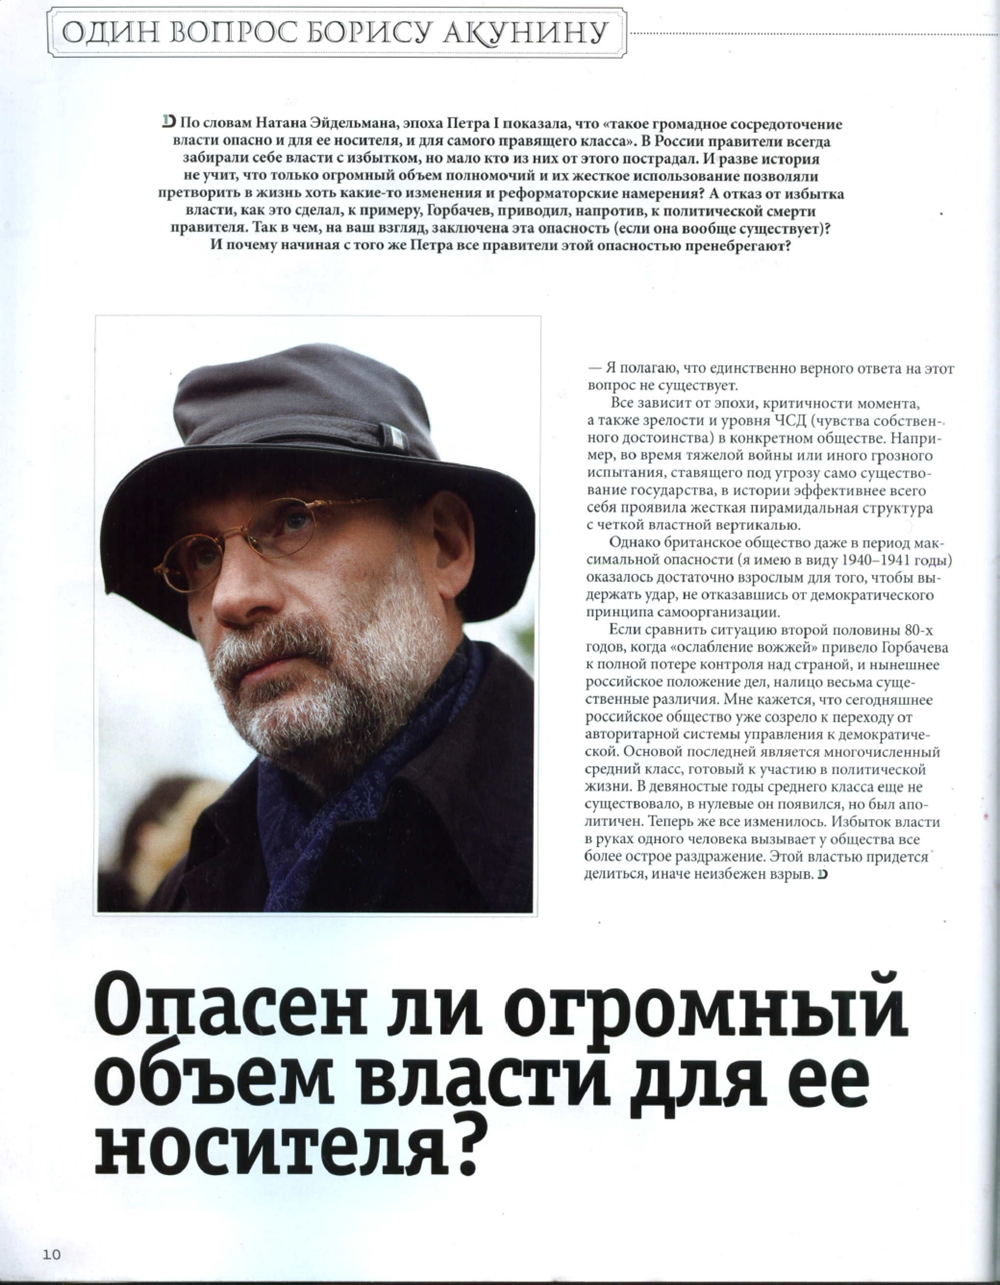 http://images.vfl.ru/ii/1404417270/545e9dc8/5616272.jpg